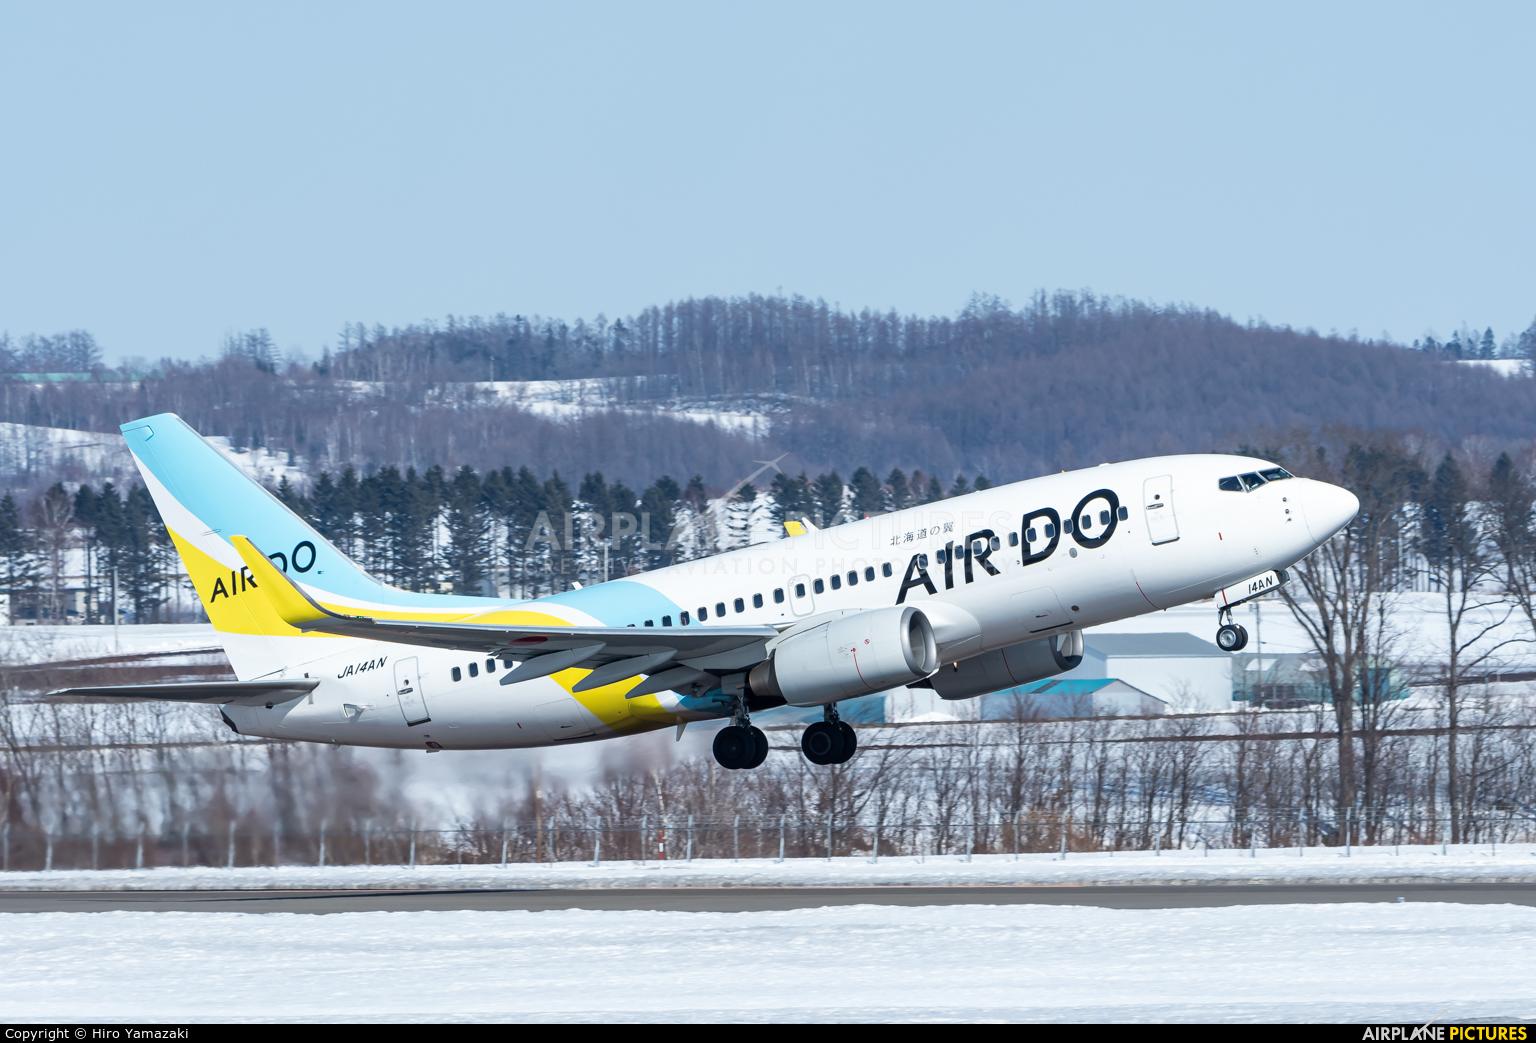 Air Do - Hokkaido International Airlines JA14AN aircraft at Memanbetsu